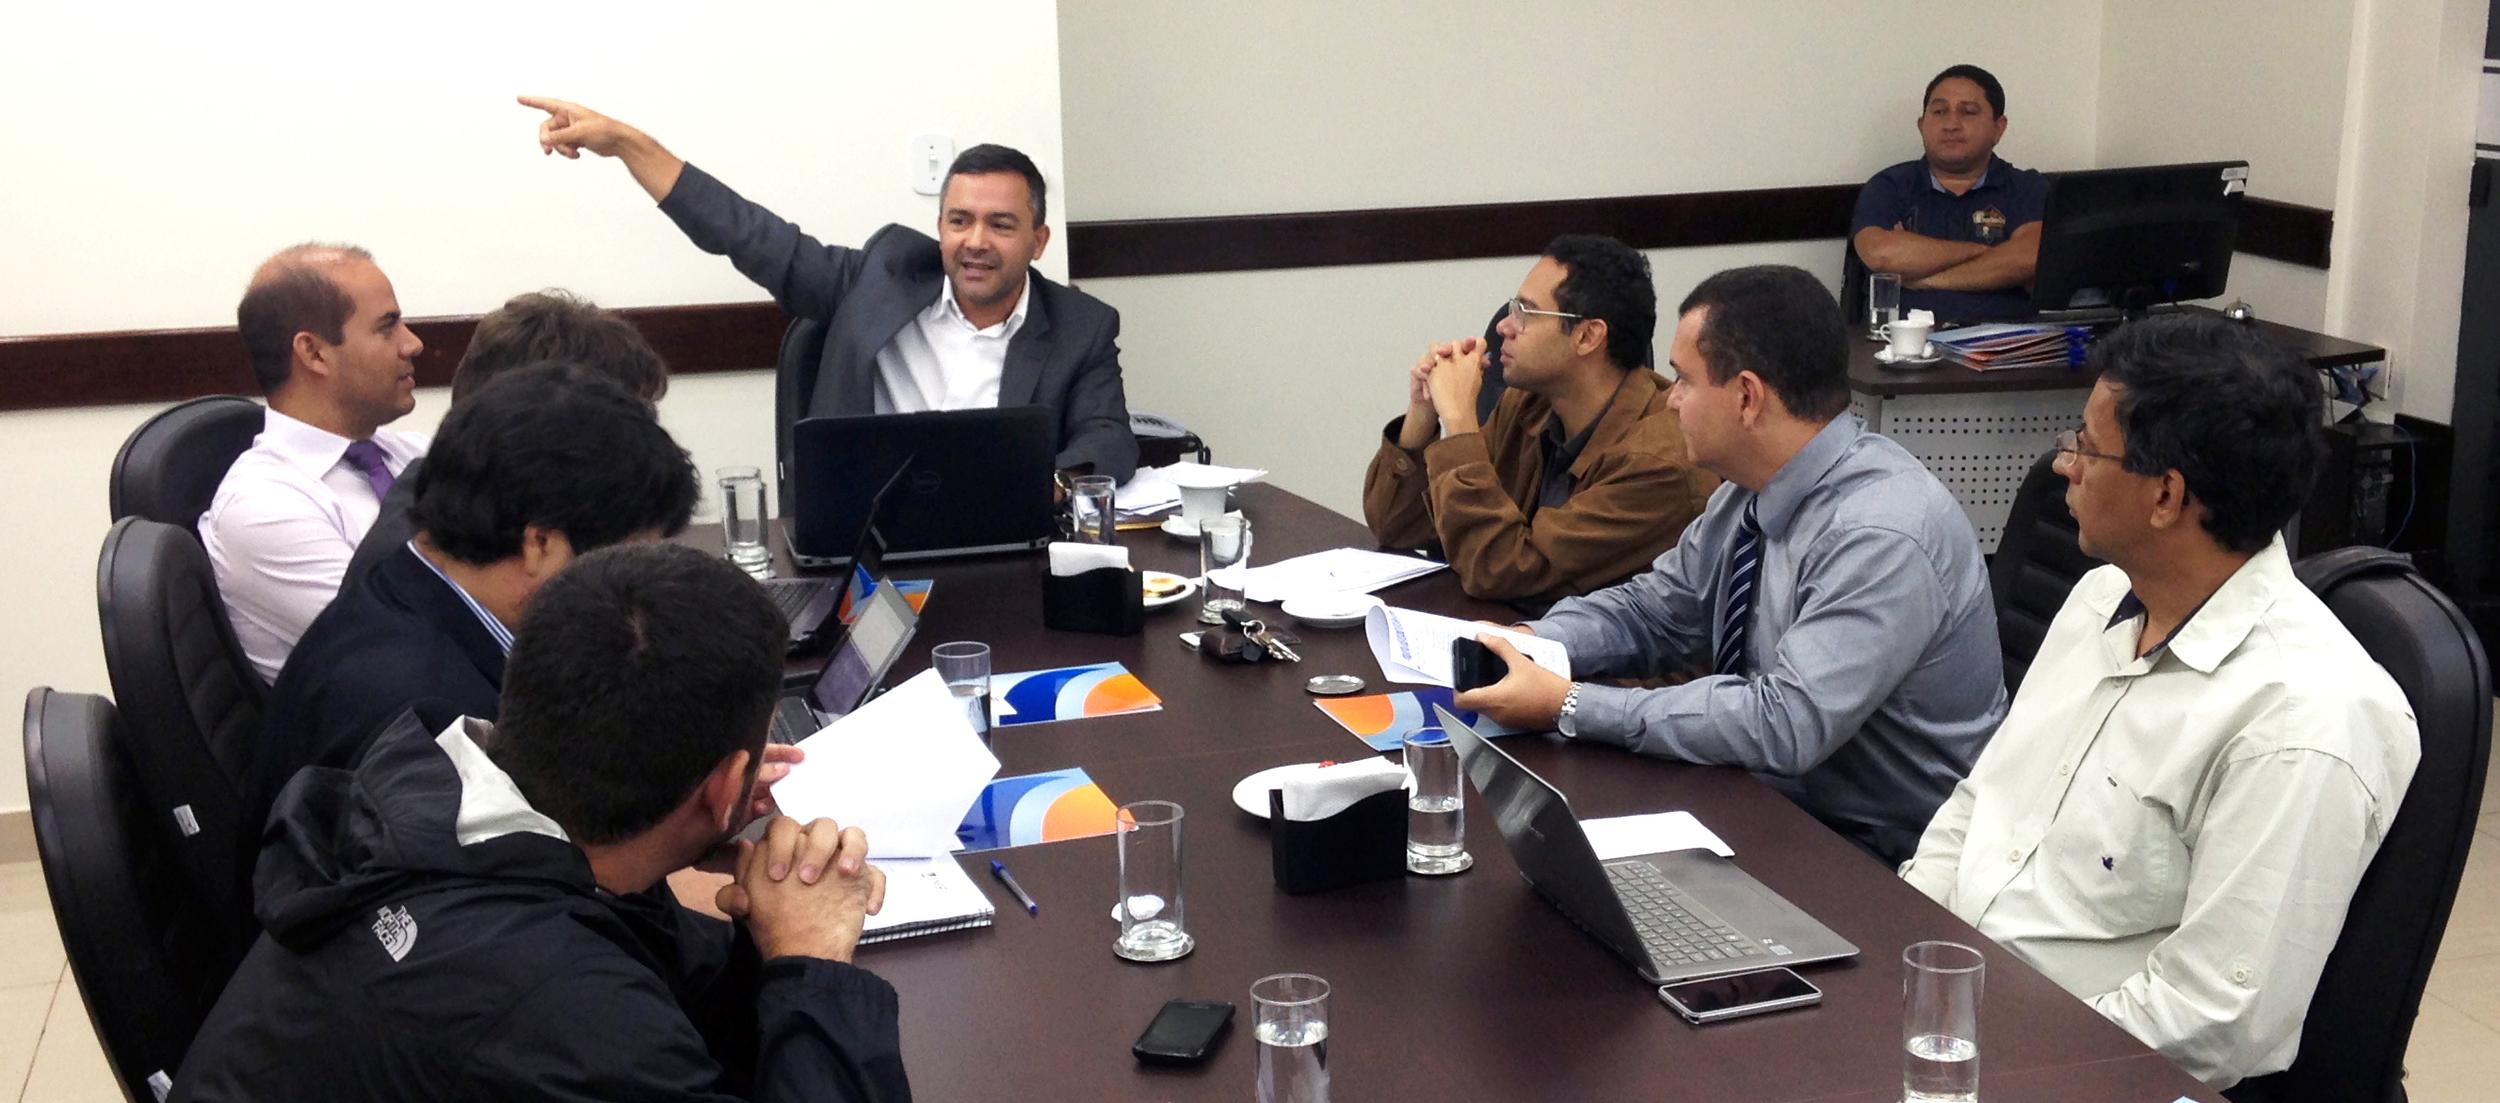 O encontro ocorreu na sede da Unacon Sindical. Foto: Filipe Calmon / ANESP